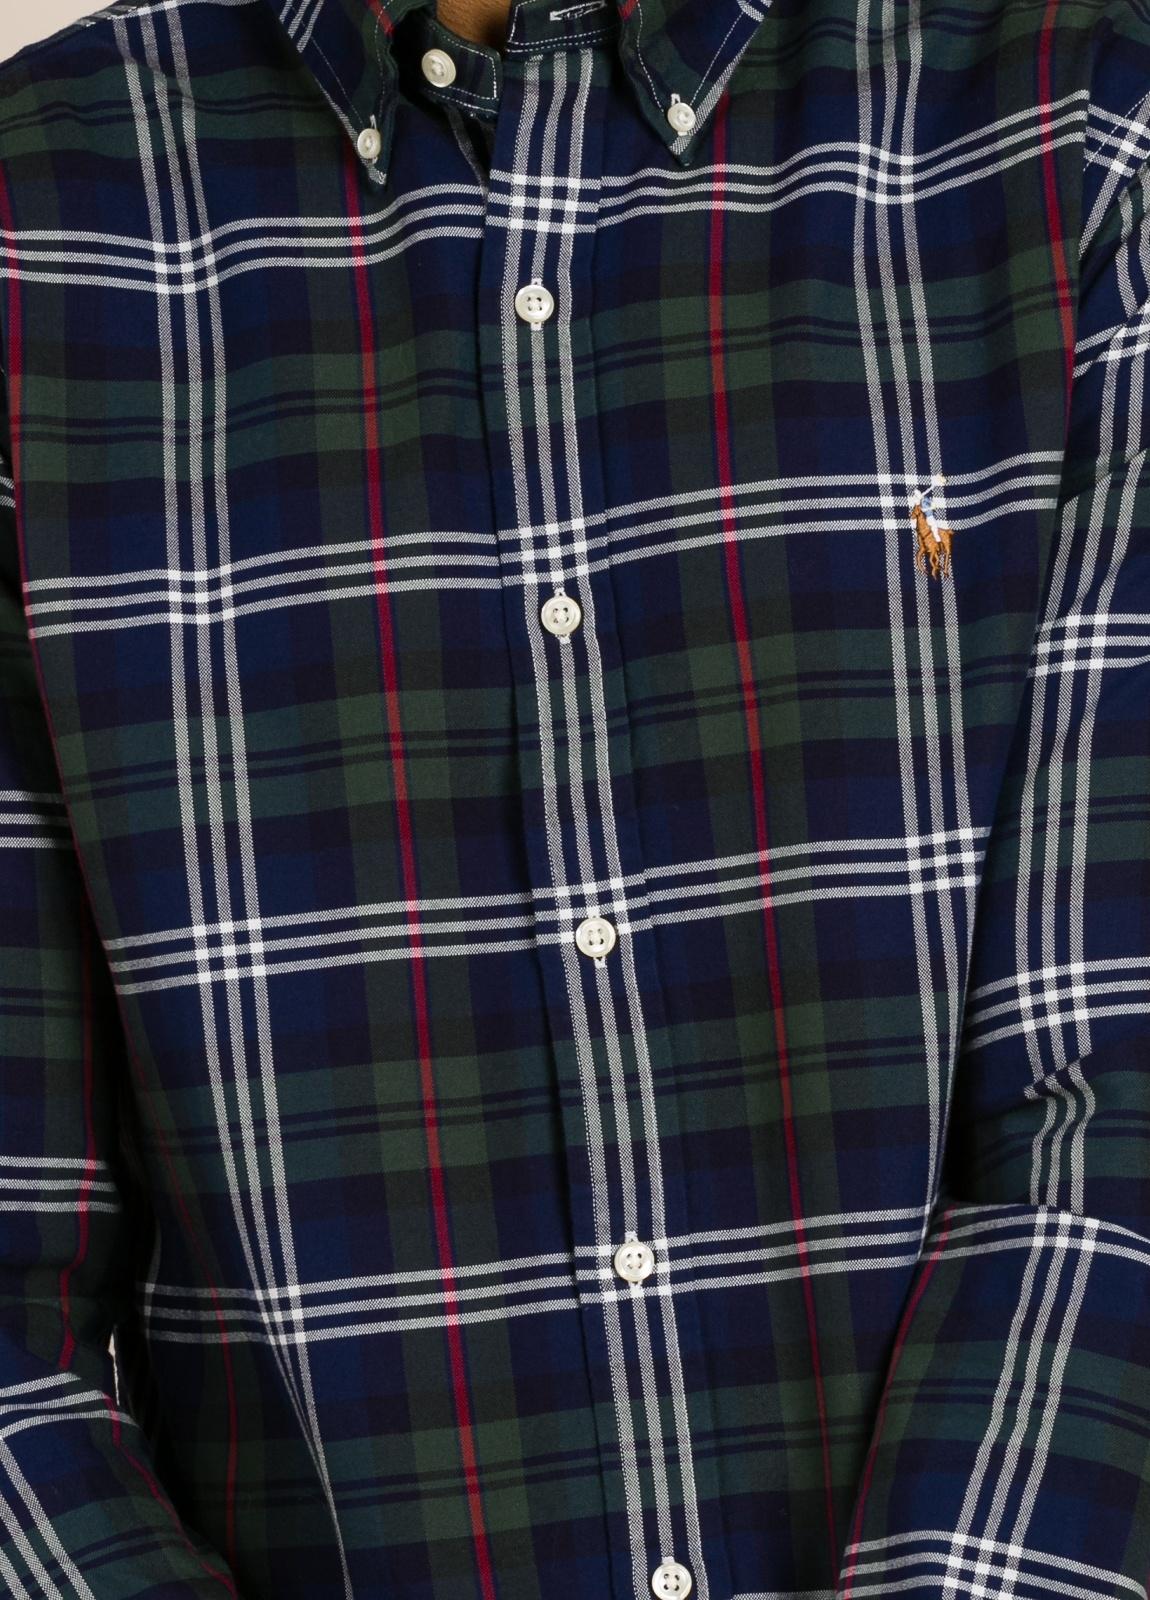 Camisa POLO RALPH LAUREN cuadros marino - Ítem2